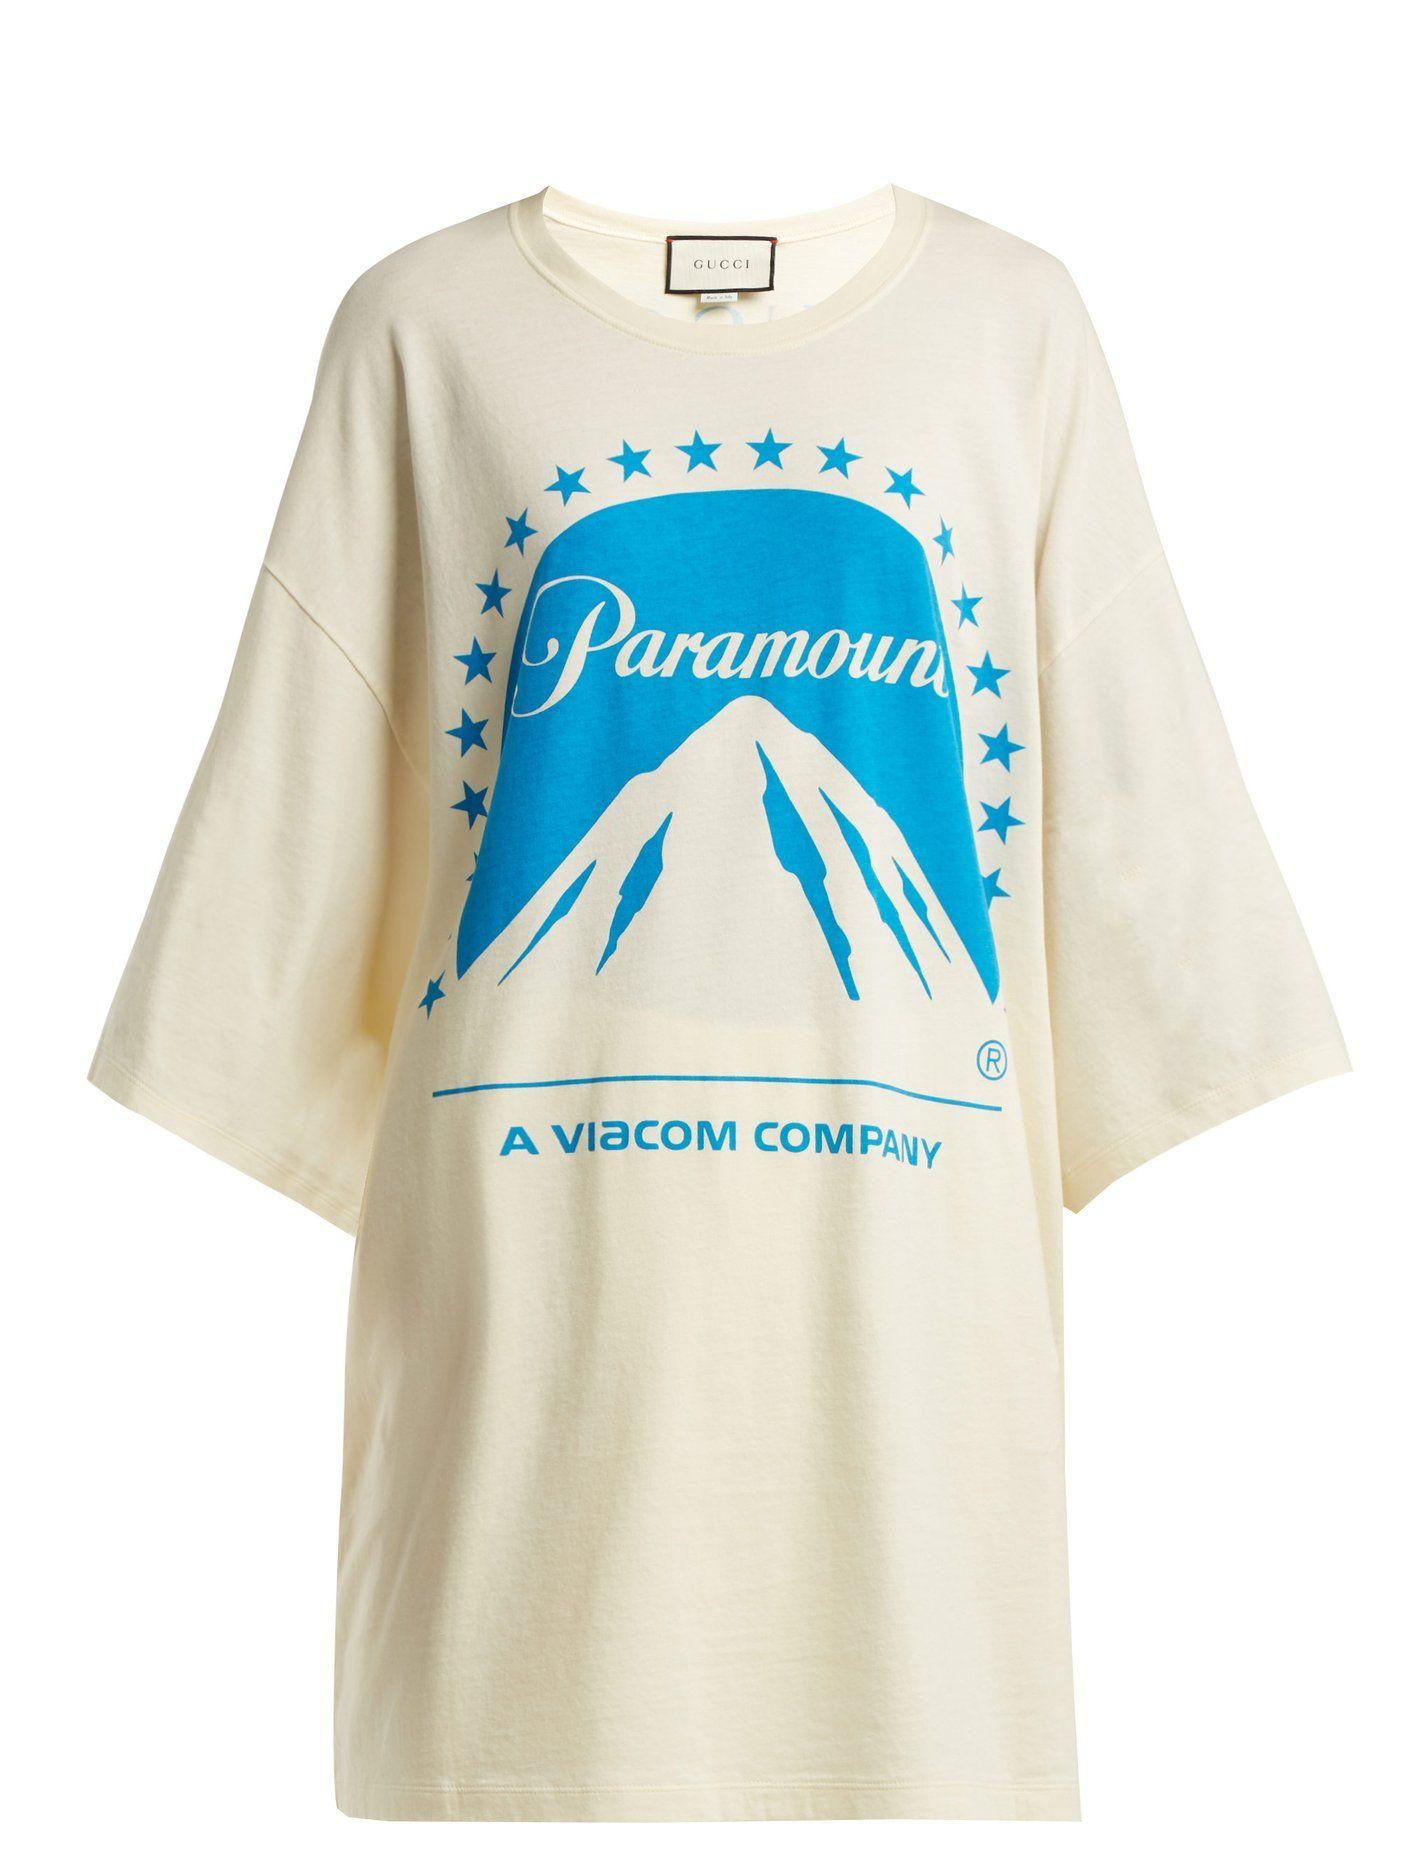 f0e1ba8a9 Paramount oversized cotton T-shirt | Gucci | MATCHESFASHION.COM ...